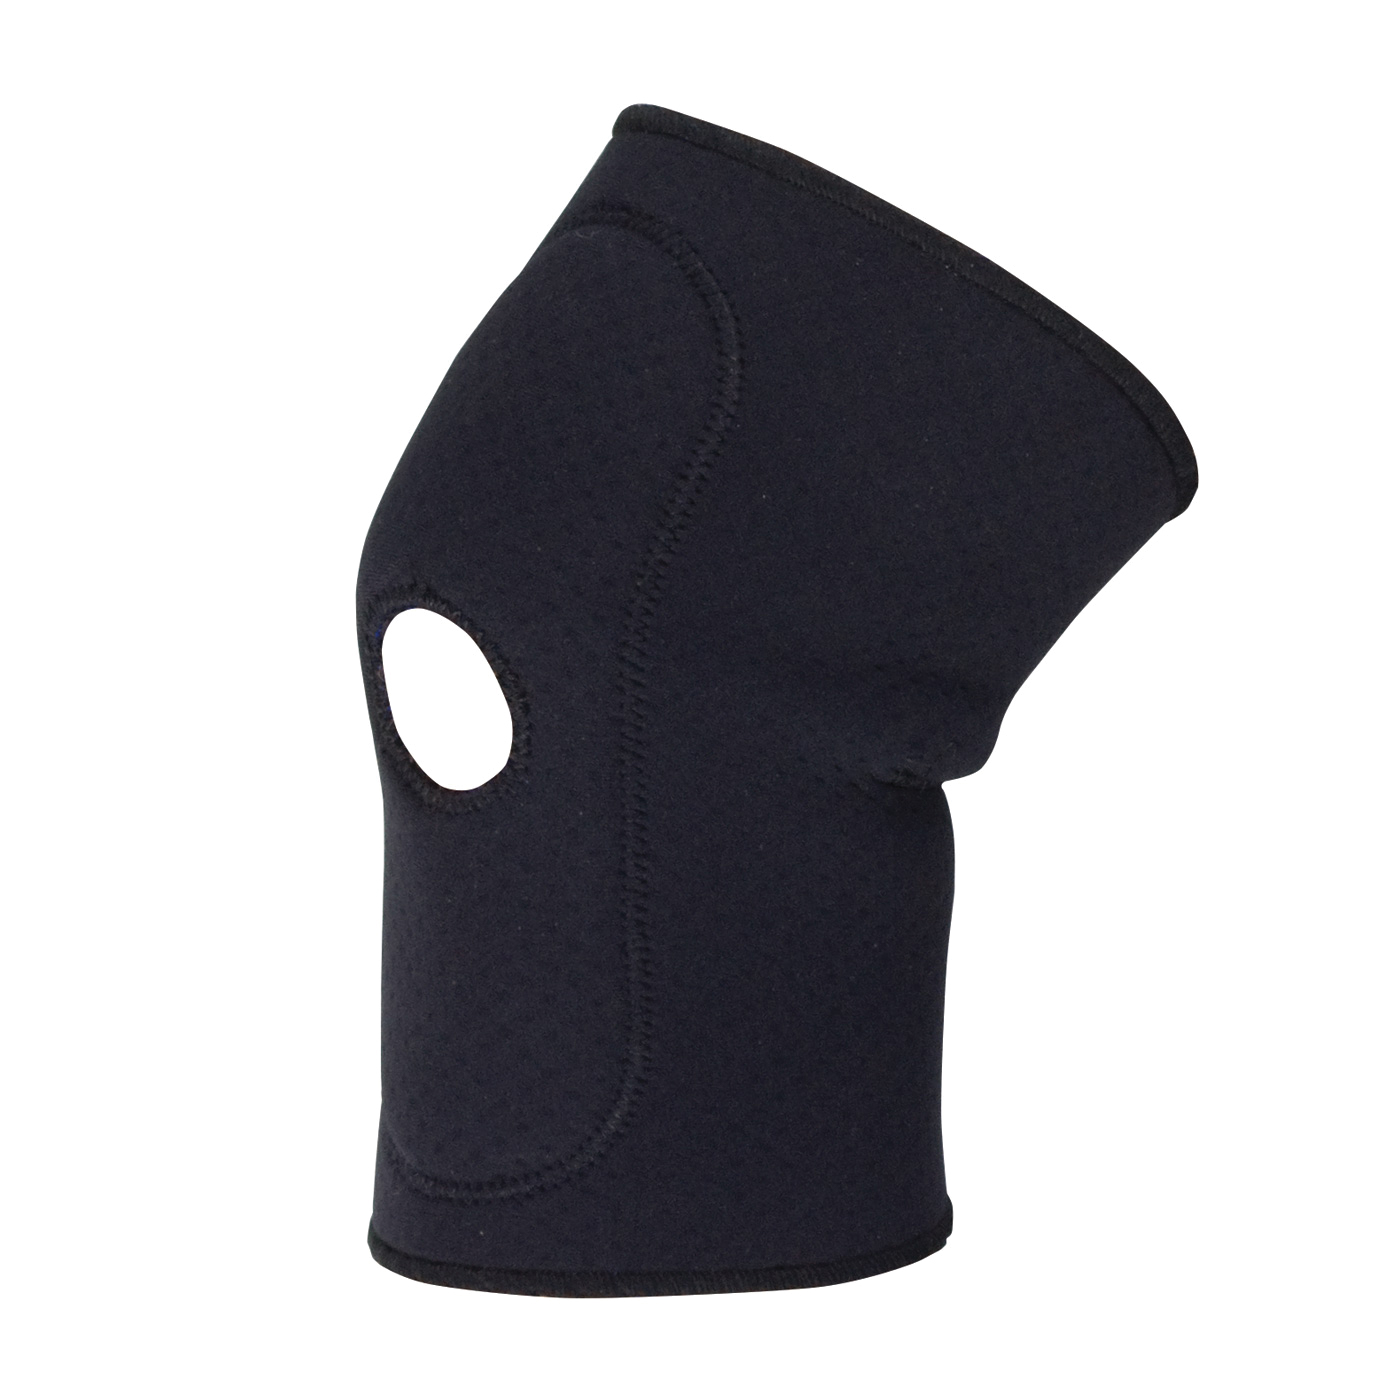 PIP® 290-9020L Ambidextrous Knee Sleeve, L, Terry Lined Neoprene/Nylon, Black